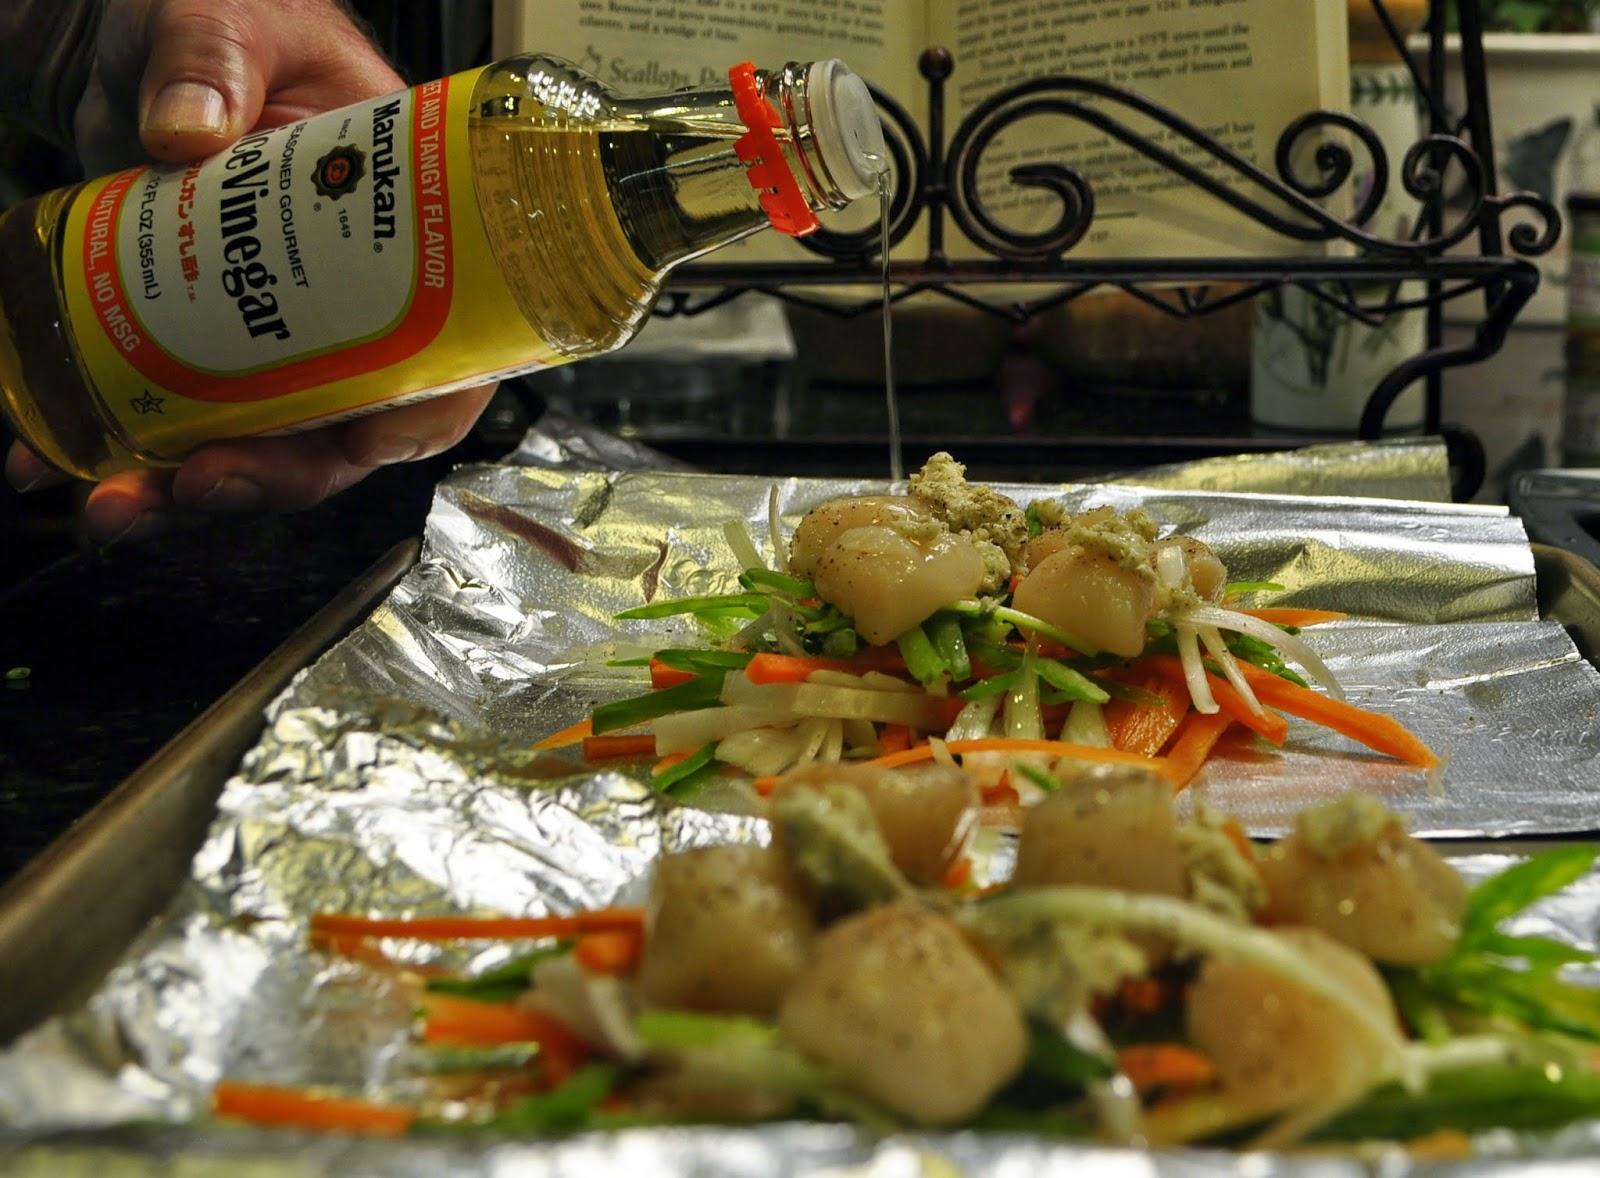 Marukan Rice Vinegar: Scallops en Papillote over Fettuccine - Create Amazing Meals